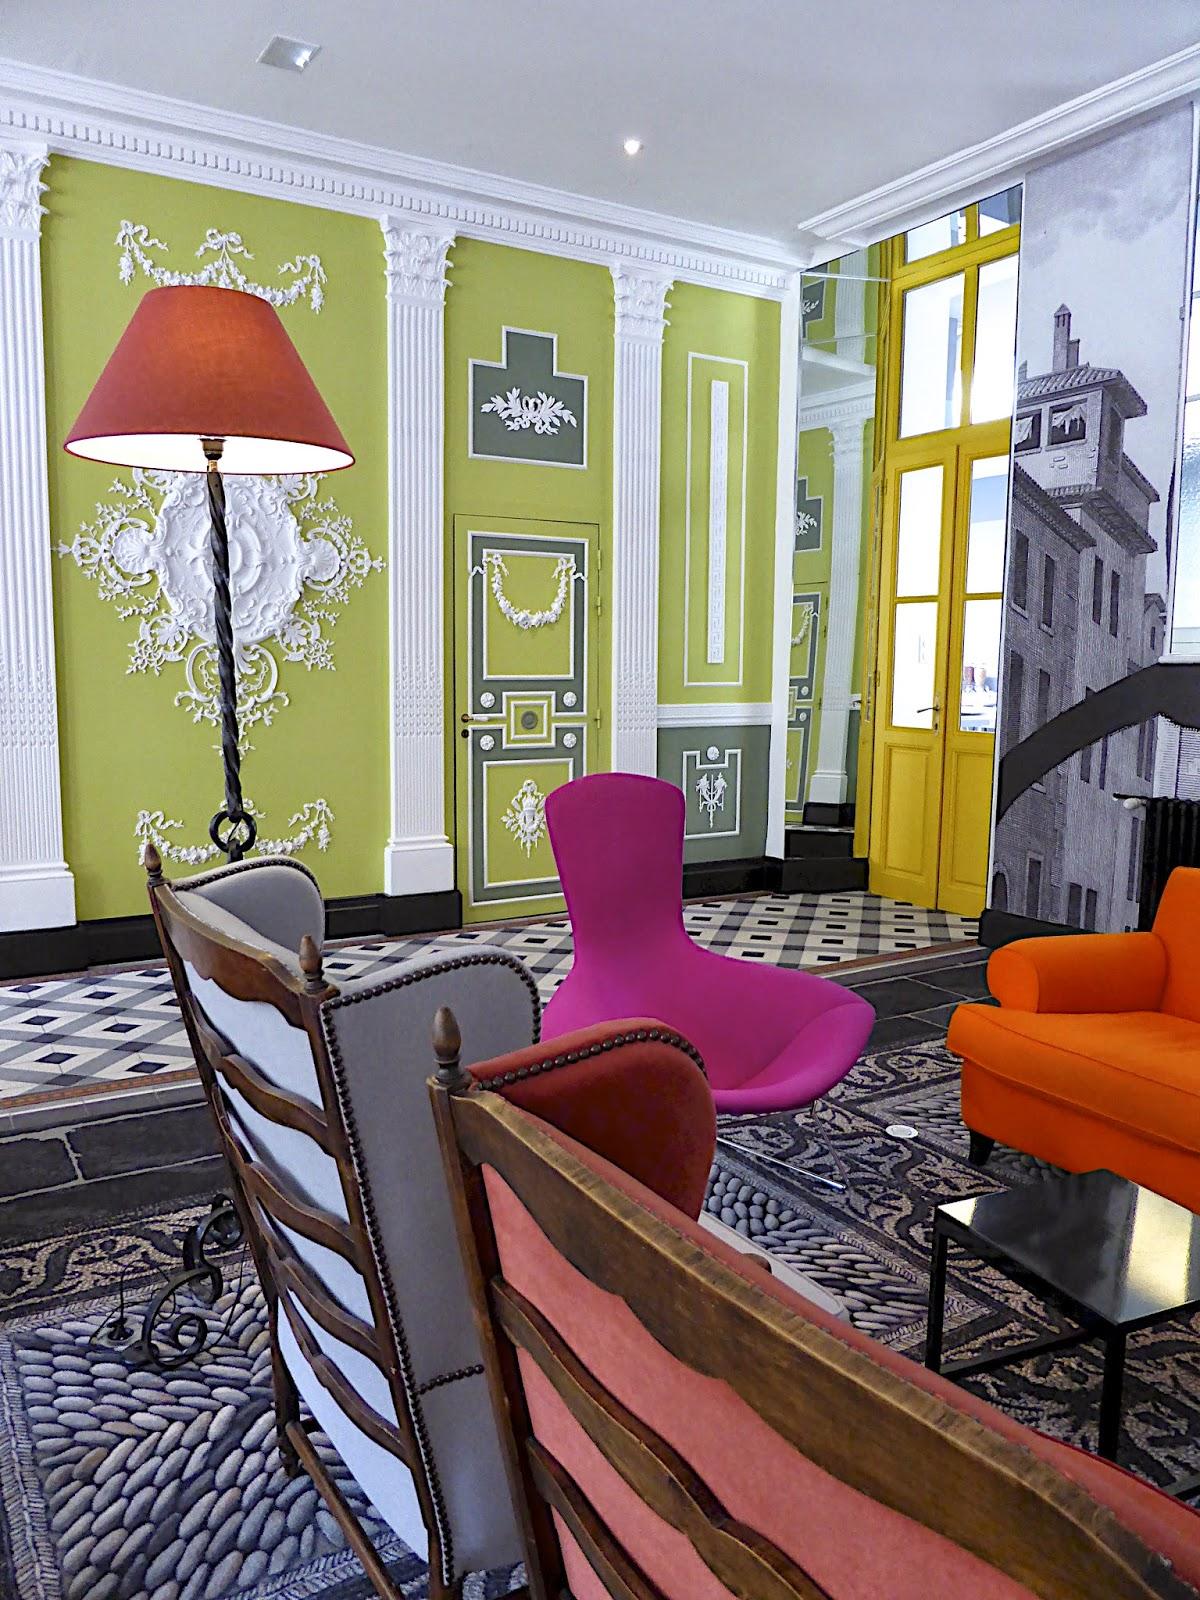 manon 21 le jules c sar arles. Black Bedroom Furniture Sets. Home Design Ideas